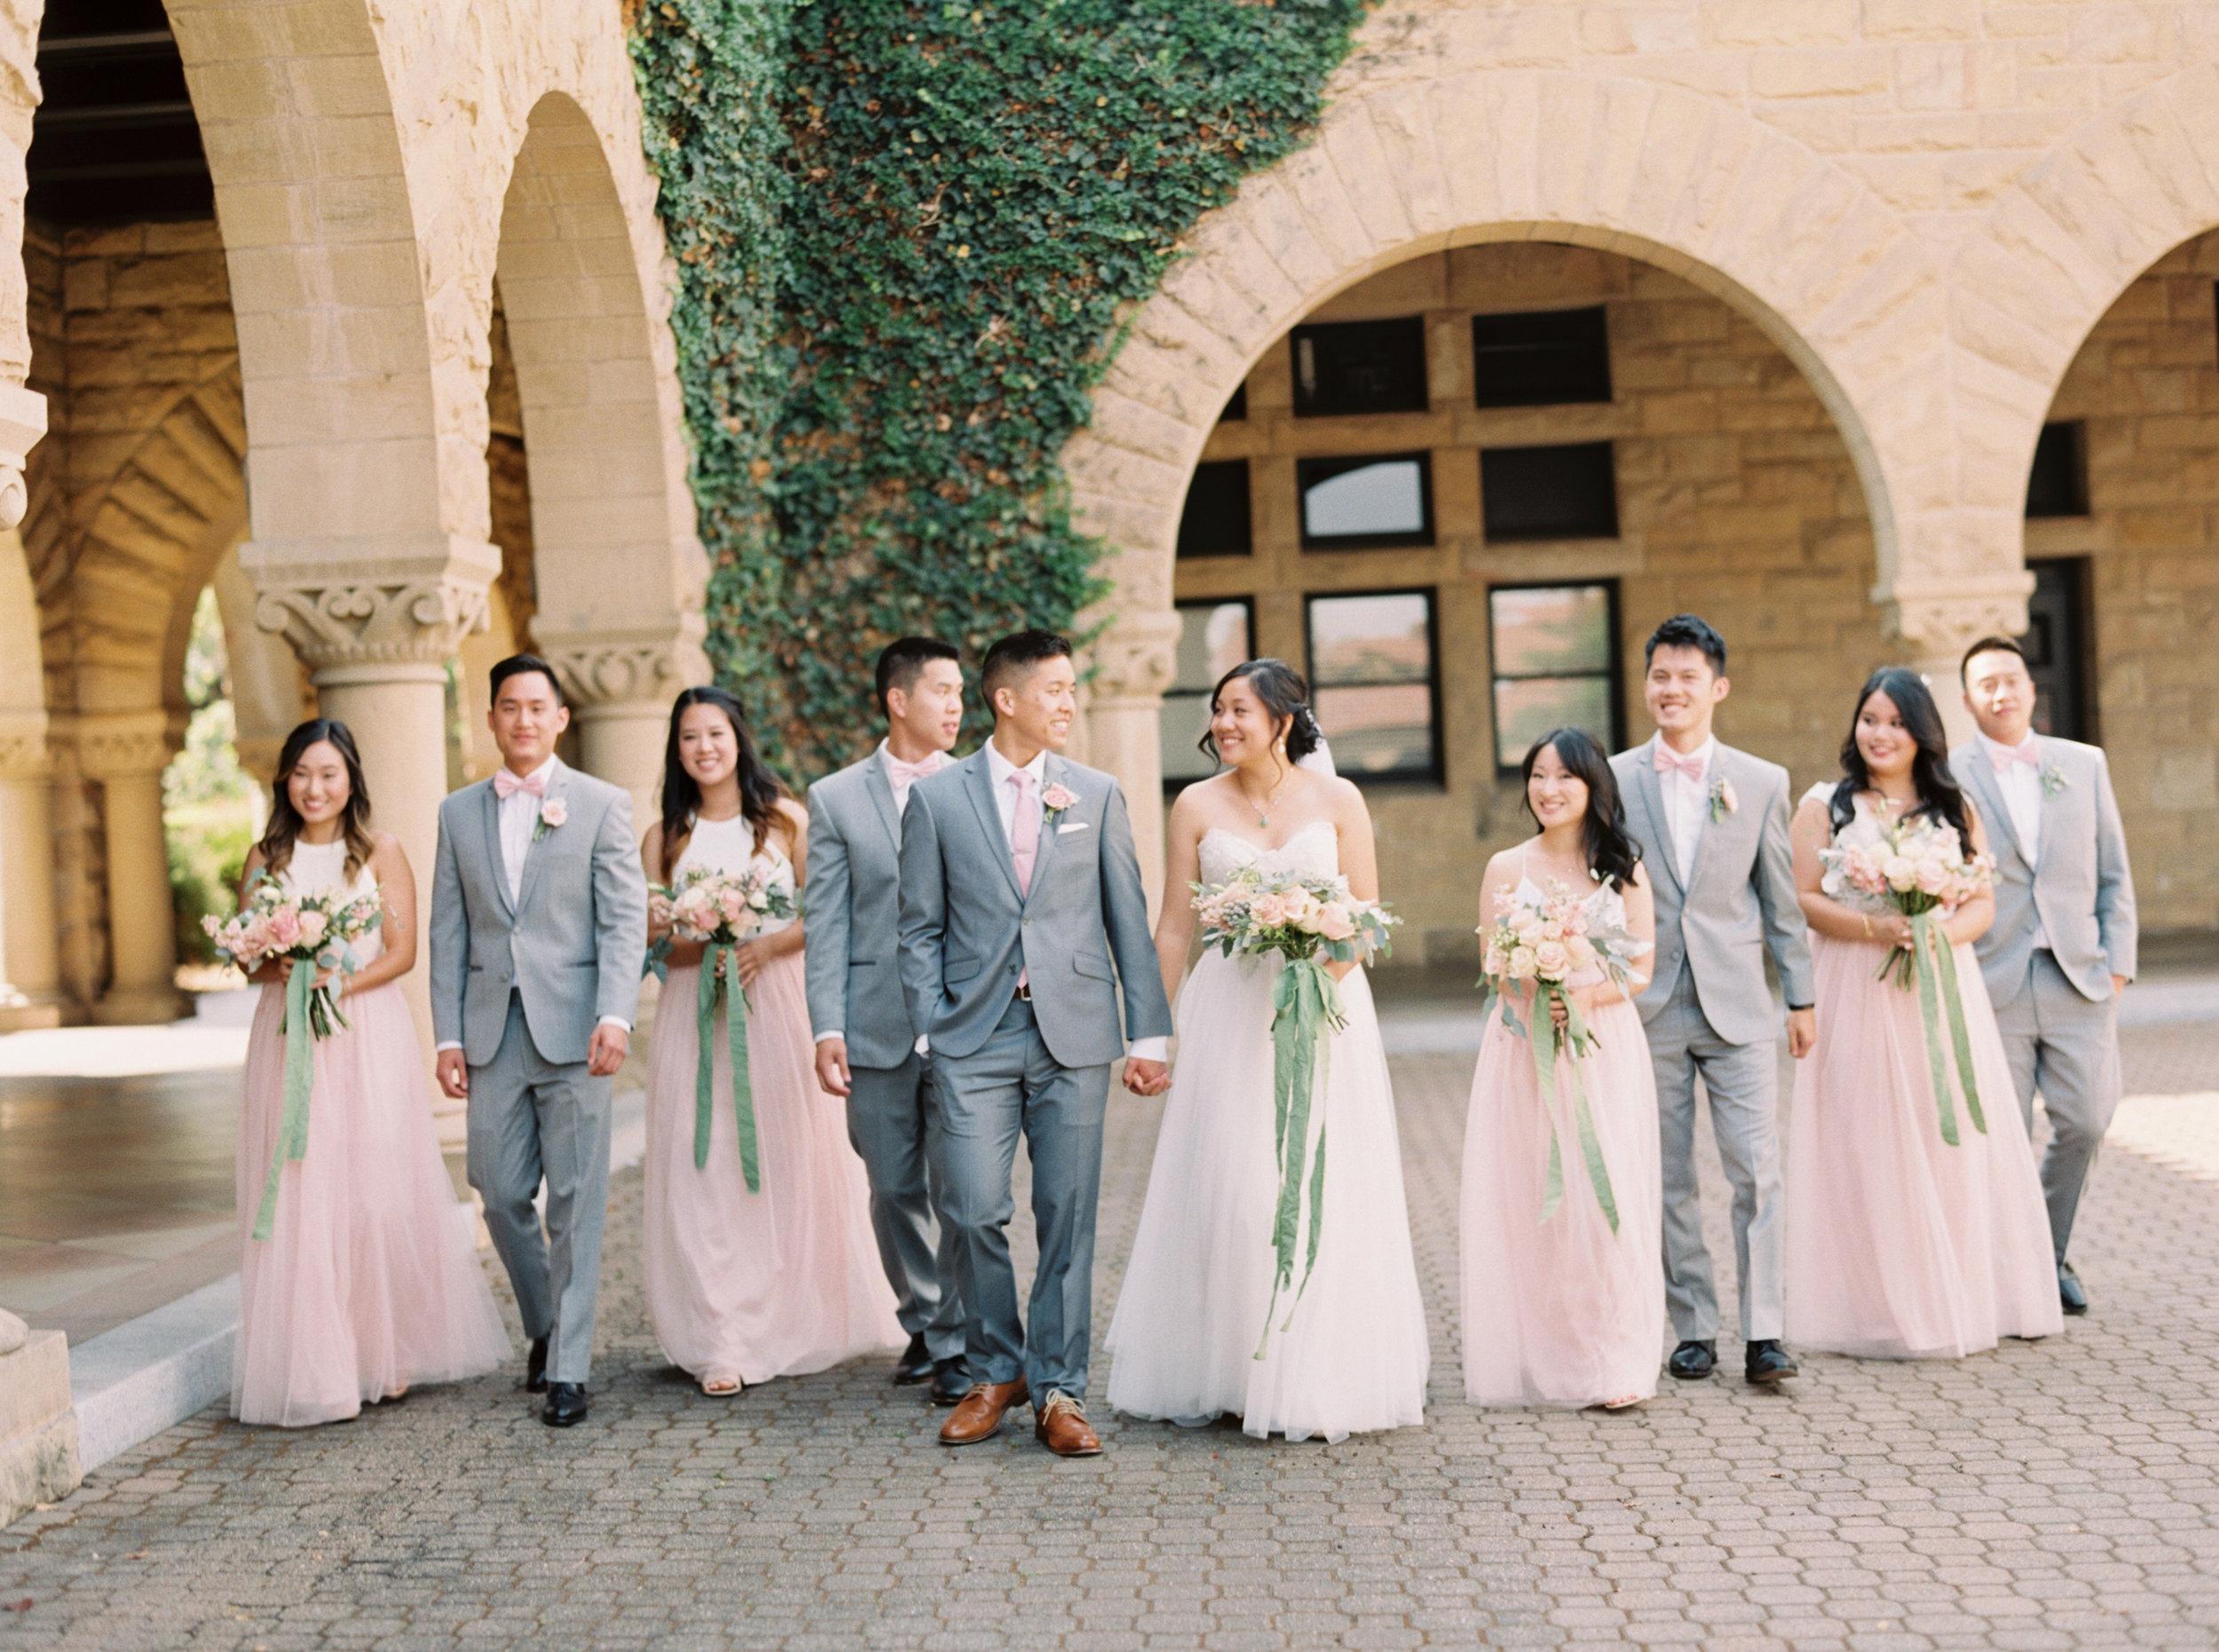 trynhphoto_wedding_photography_Standford_PaloAlto_SF_BayArea_Destination_OC_HA-138.jpg